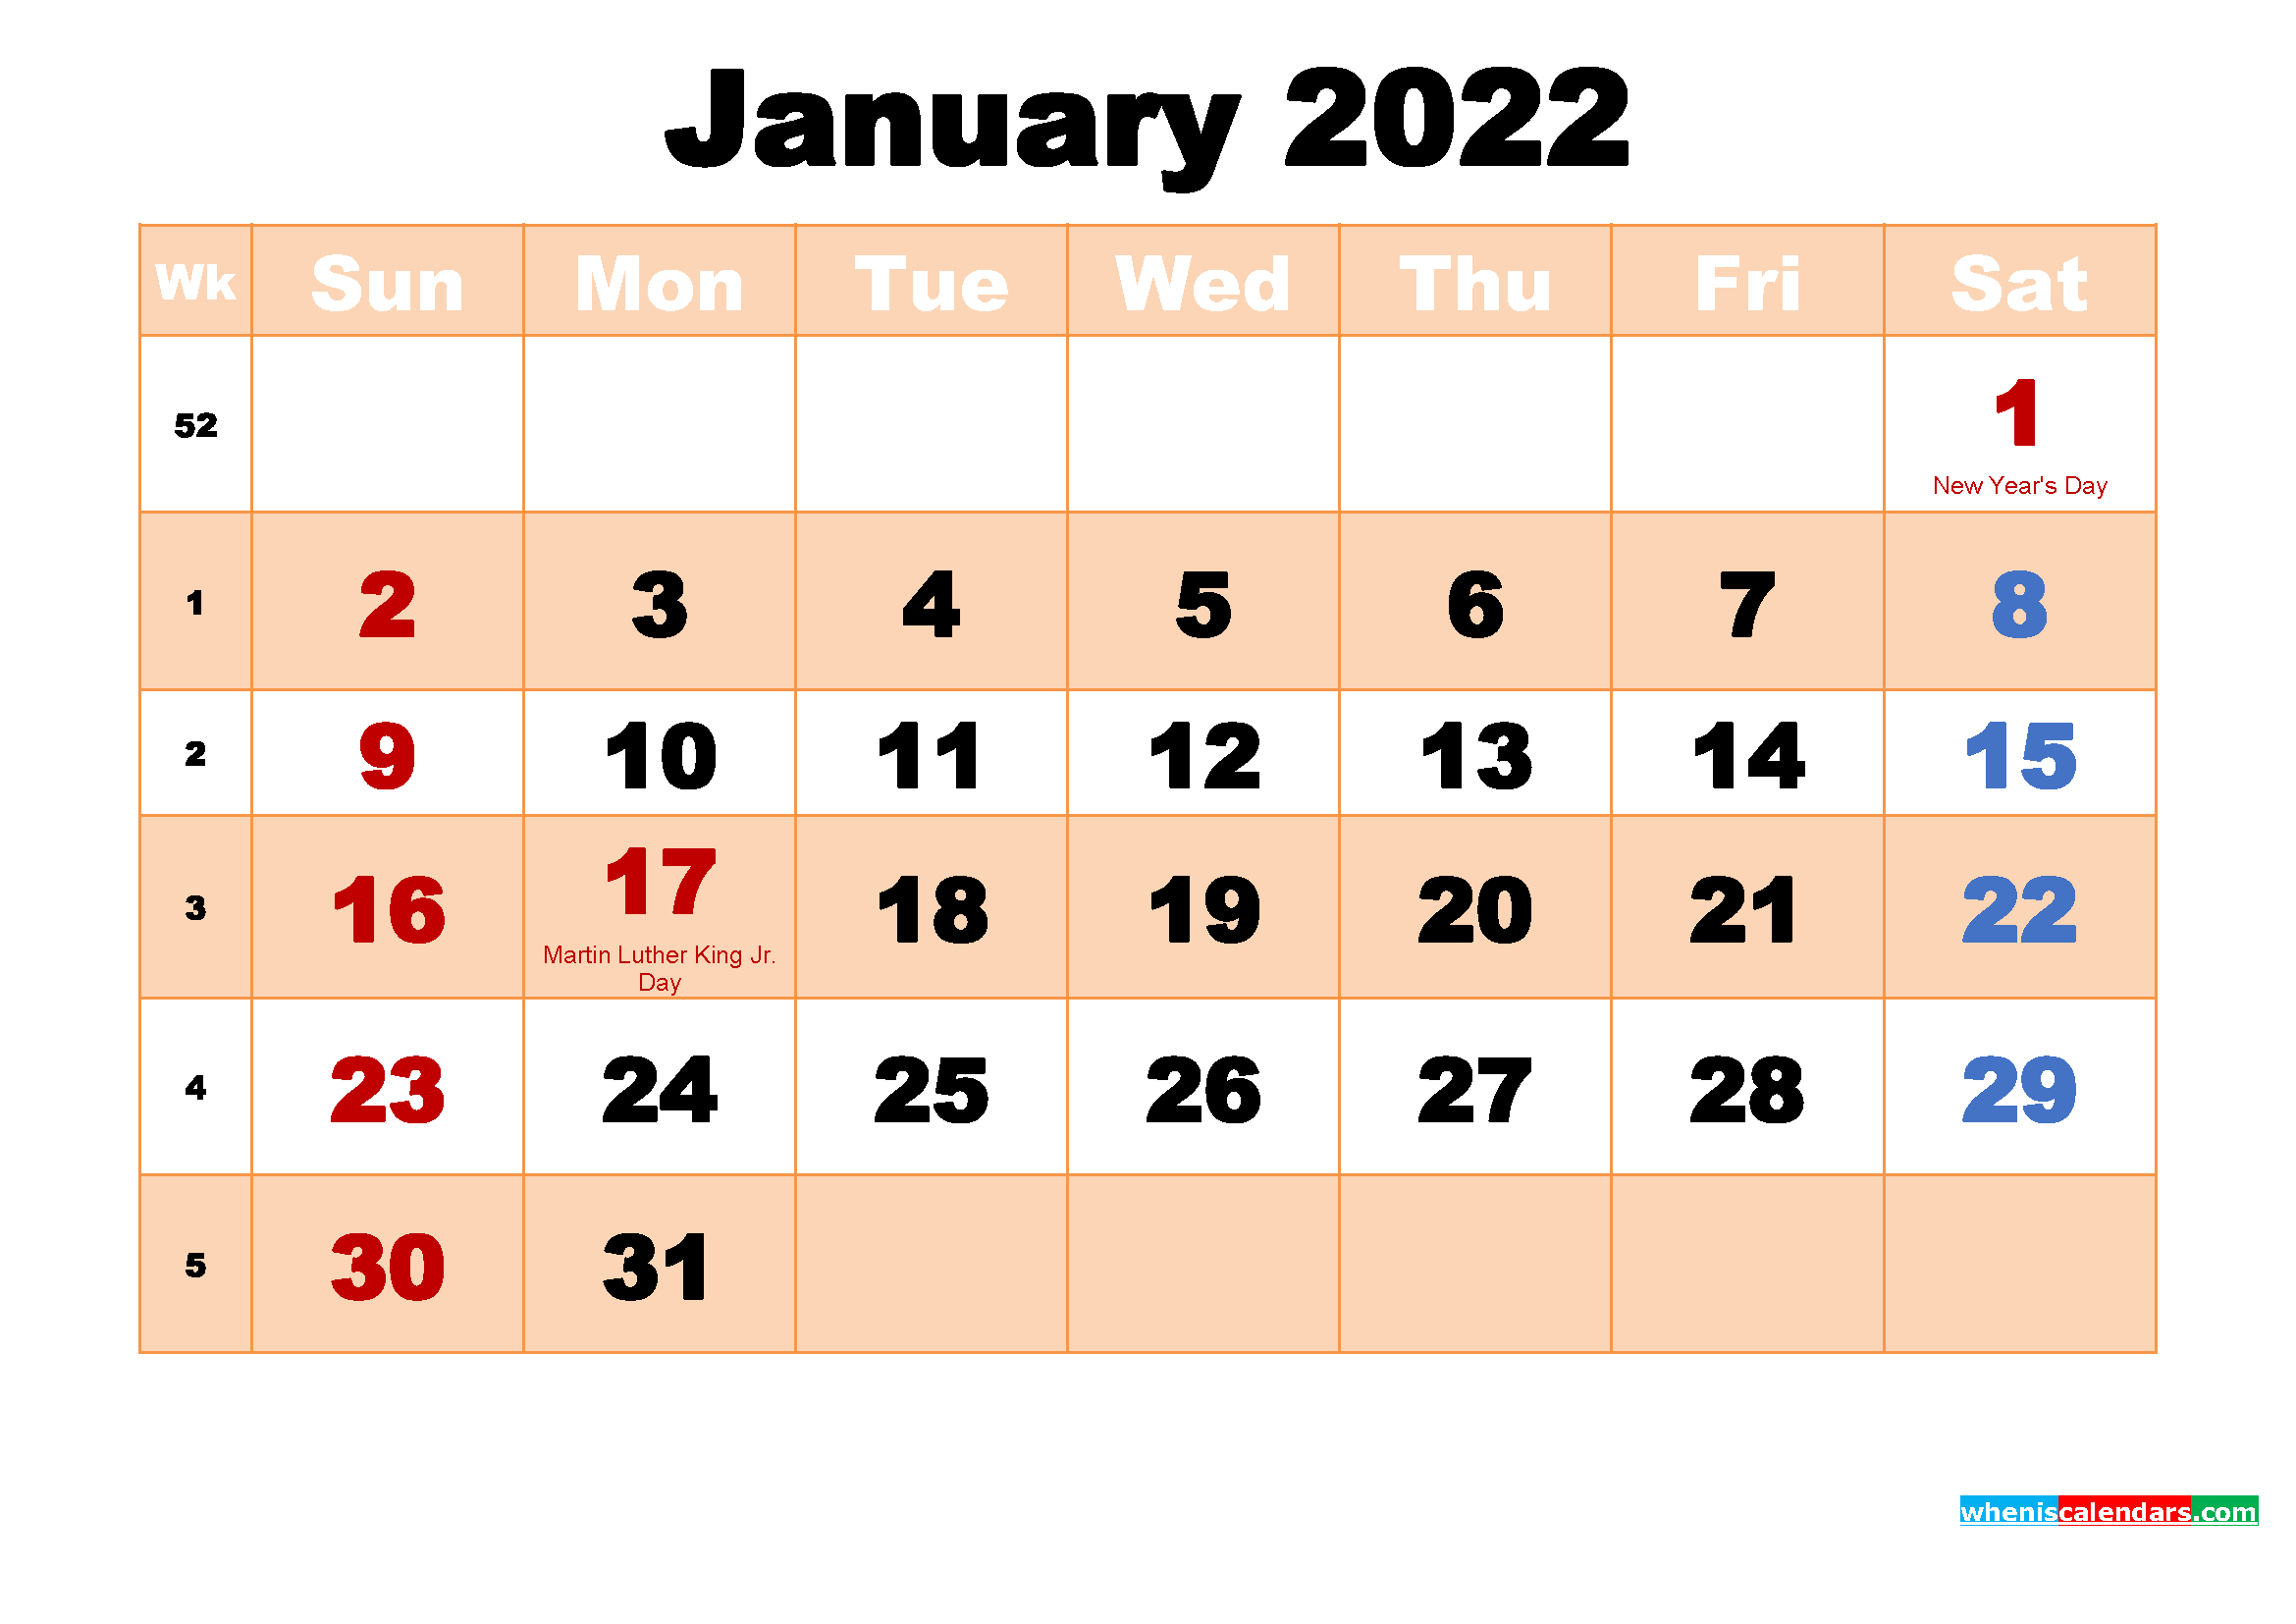 Free Printable January 2022 Calendar With Holidays within Free Printable January Calendar 2022 Photo